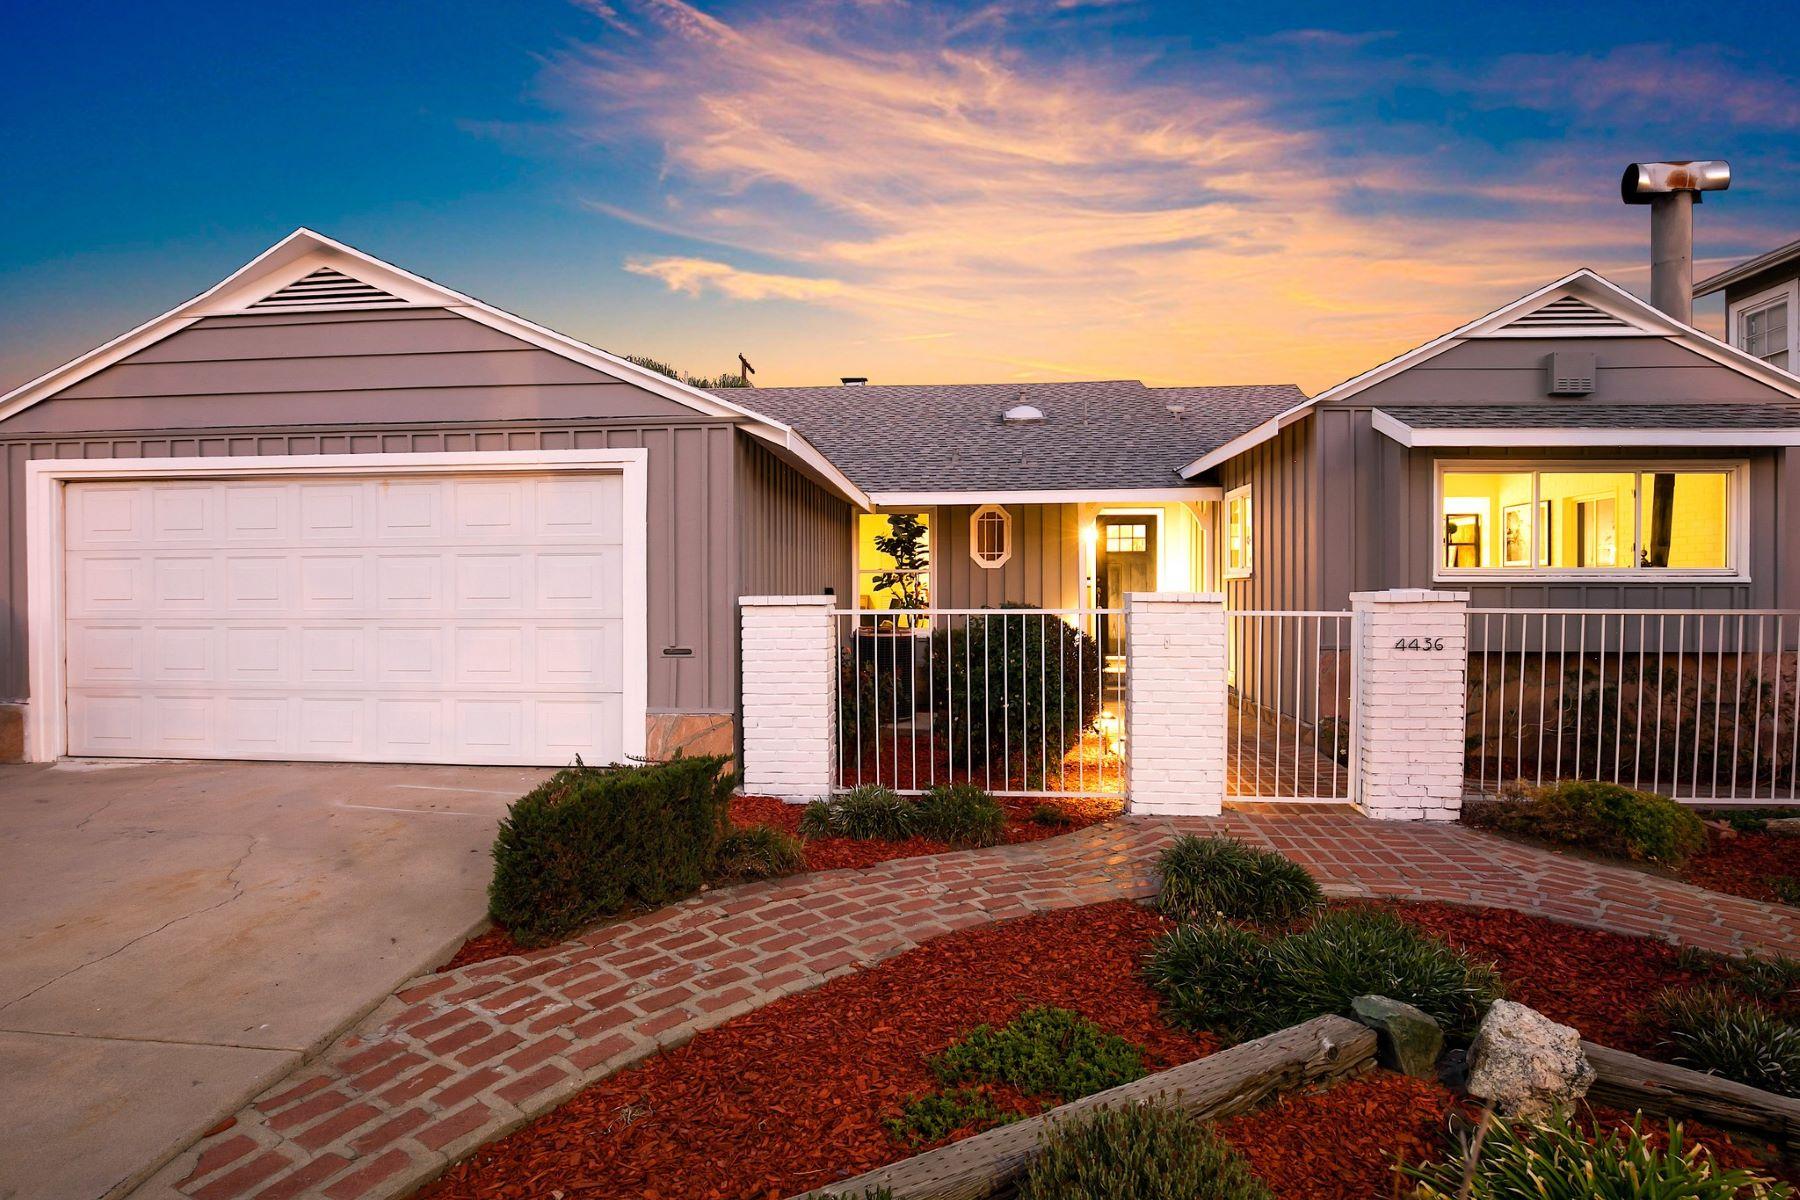 Single Family Homes for Sale at 4436 Beeman Avenue Studio City, California 91604 United States